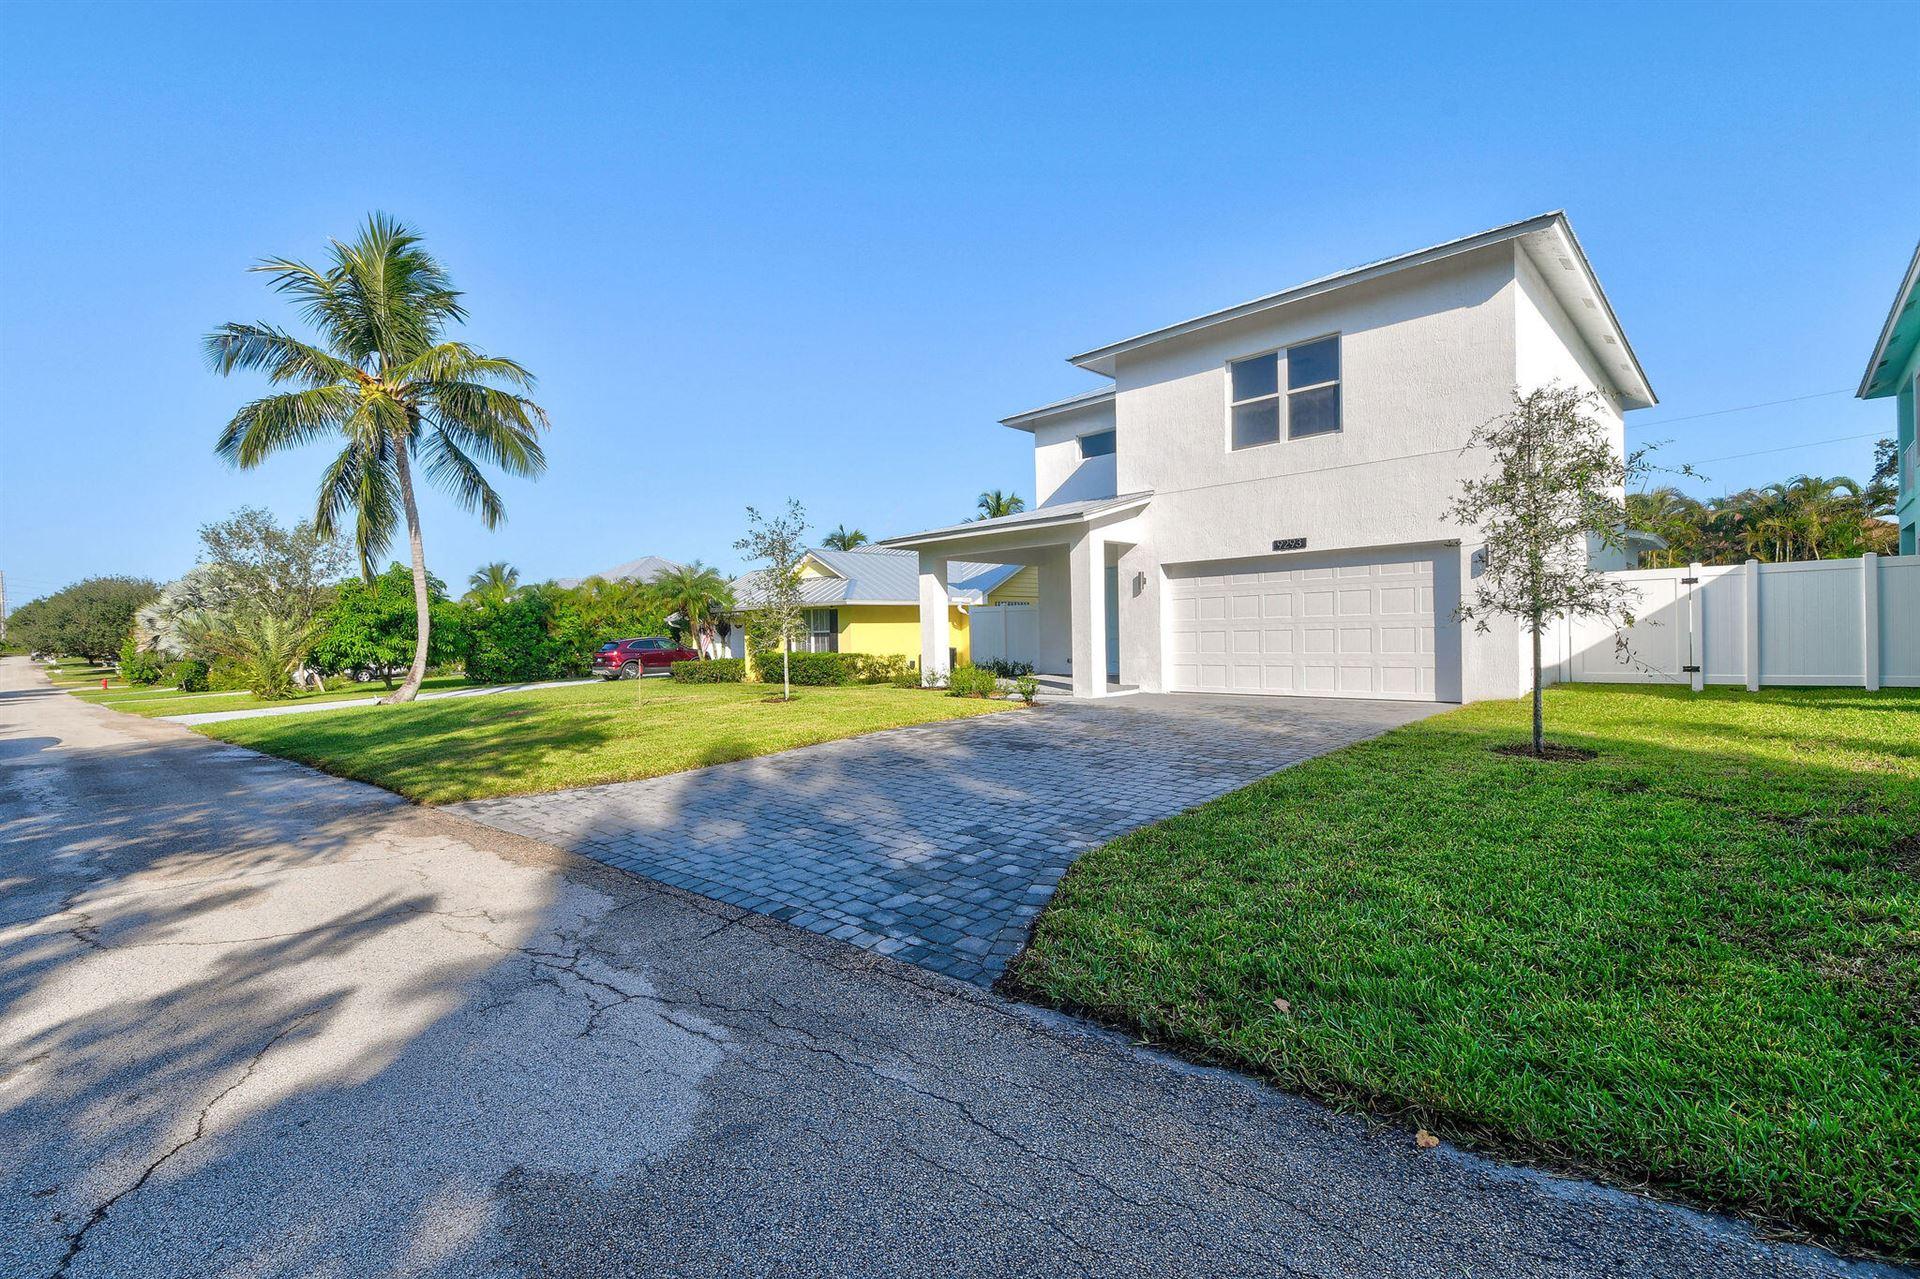 Photo of 9293 SE Saturn Street, Hobe Sound, FL 33455 (MLS # RX-10744633)